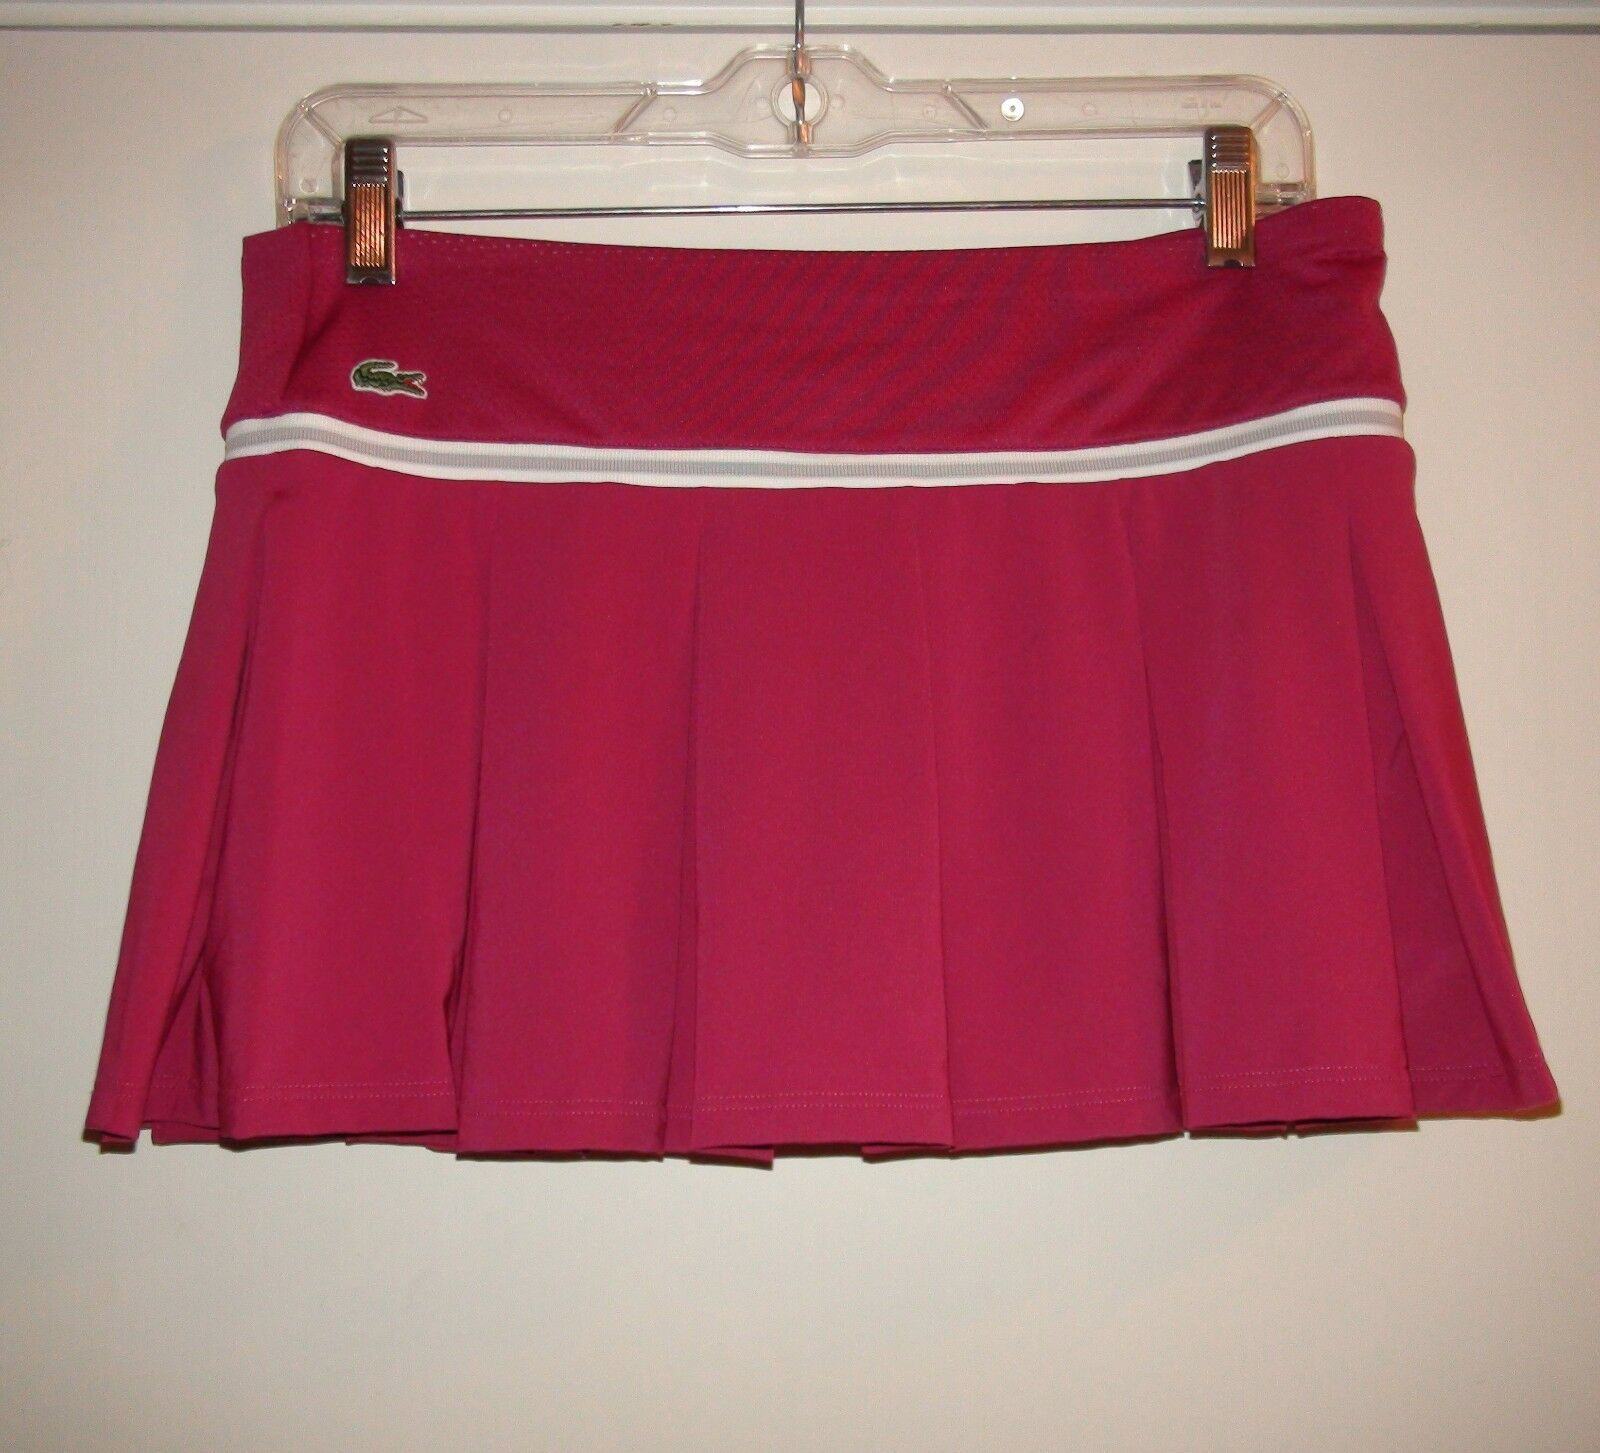 Women's LACOSTE SPORT Technical Pique Dark Pink Tennis Skirt Skort Sz 4 36 NWT